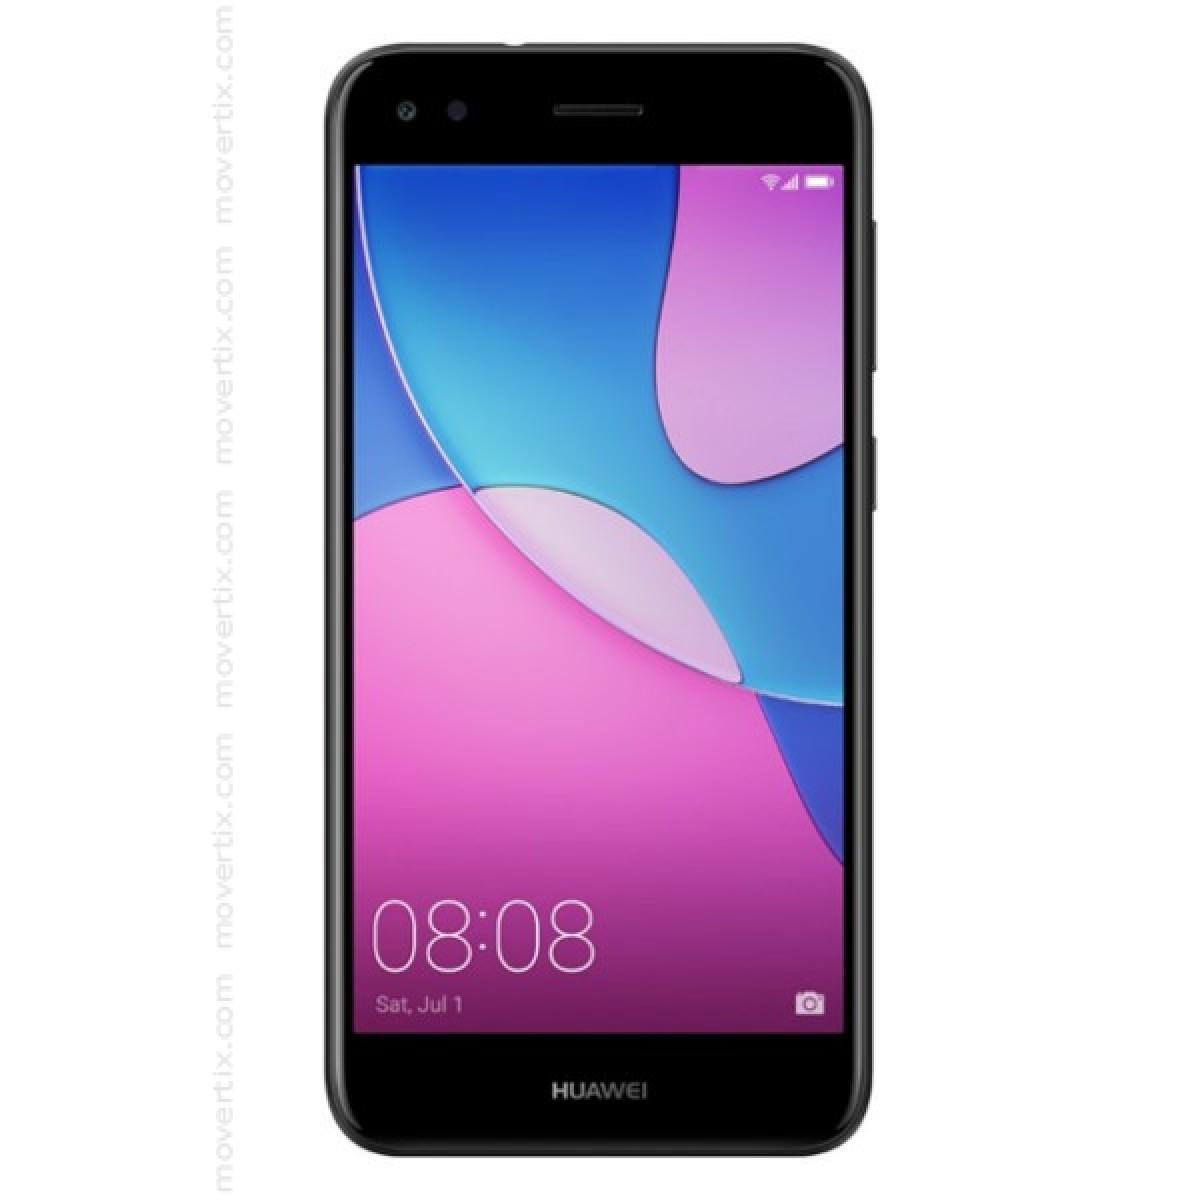 huawei y6 pro 2017 dual sim black 6901443193035 movertix mobile phones shop. Black Bedroom Furniture Sets. Home Design Ideas